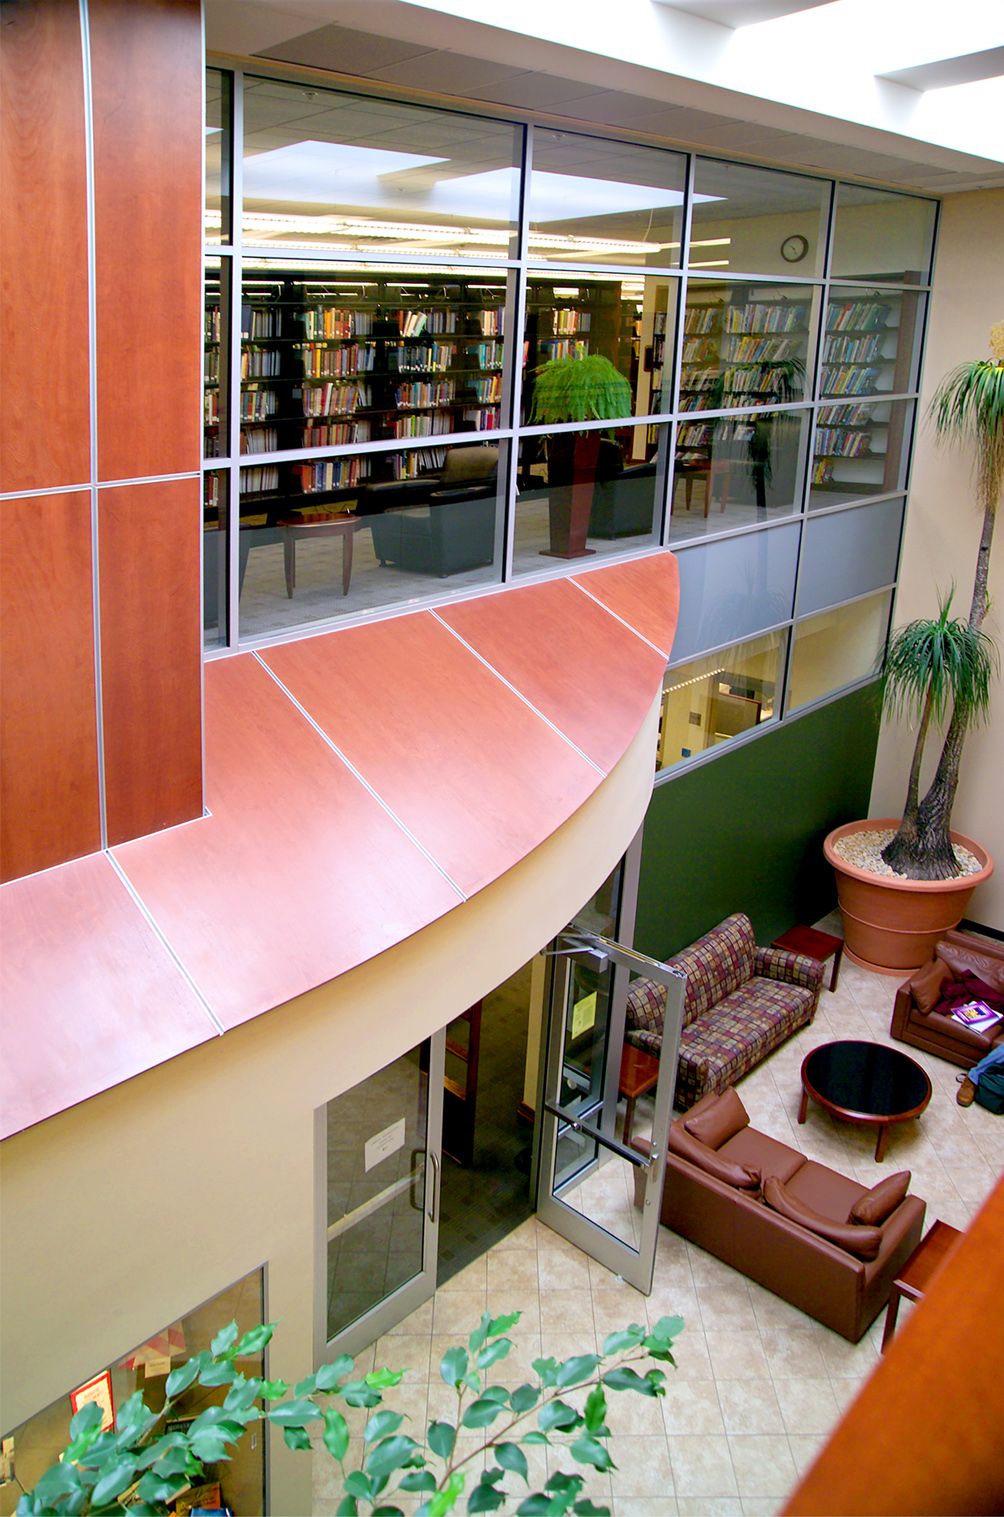 Penn State York – Smith Atrium and Lee Glatfelter Library